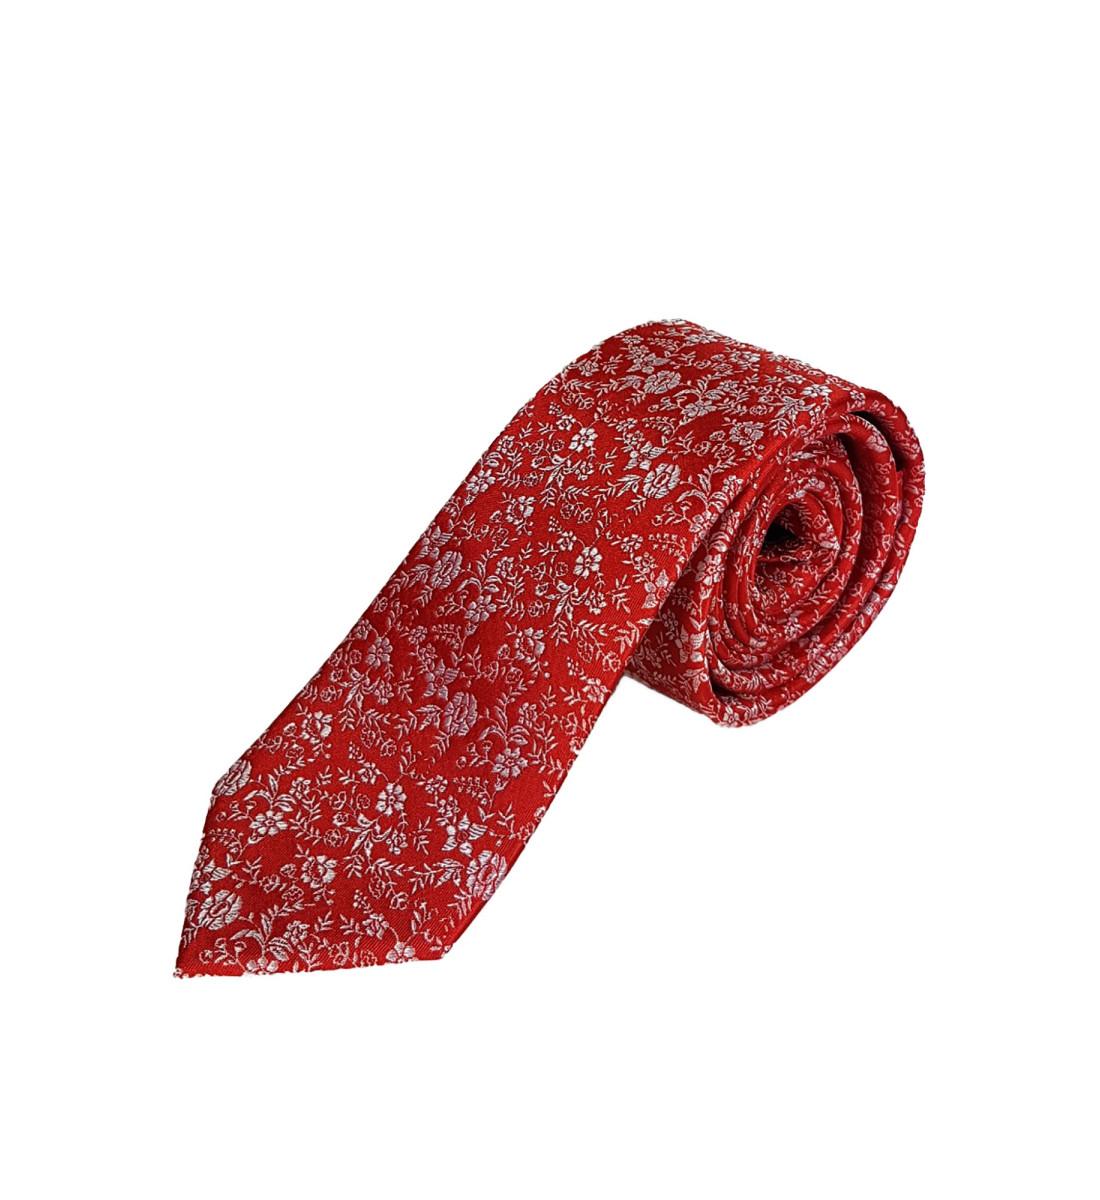 Cravate fine fantaisie 100% soie ROUGE